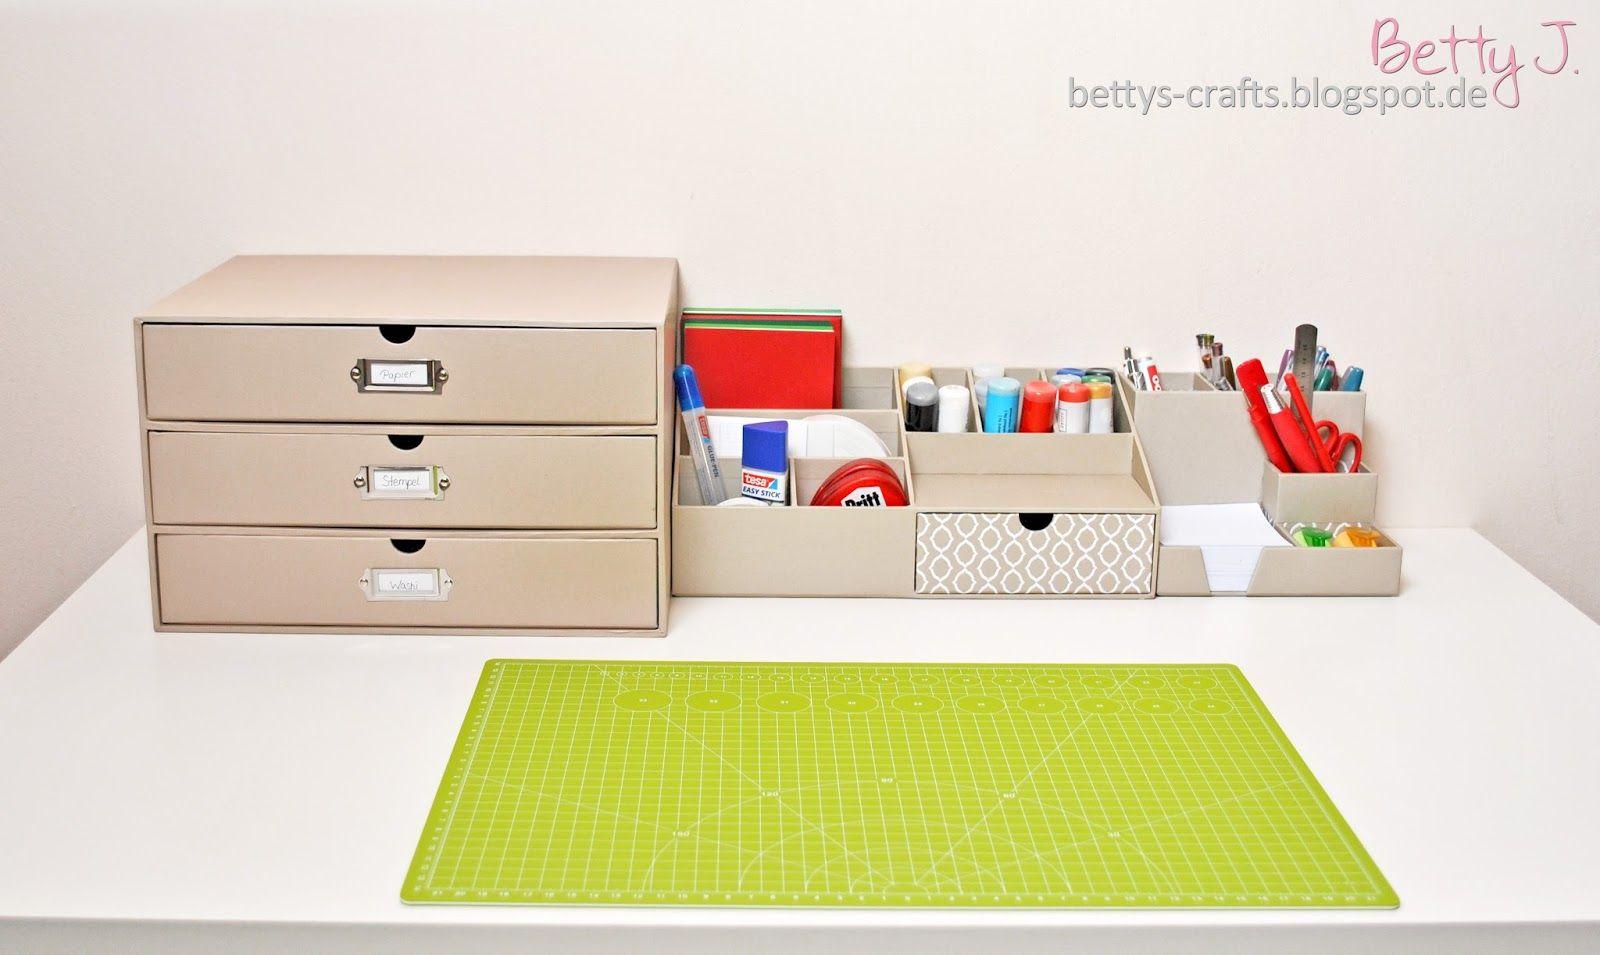 3 tips for your desktop organisation (craft stuff)